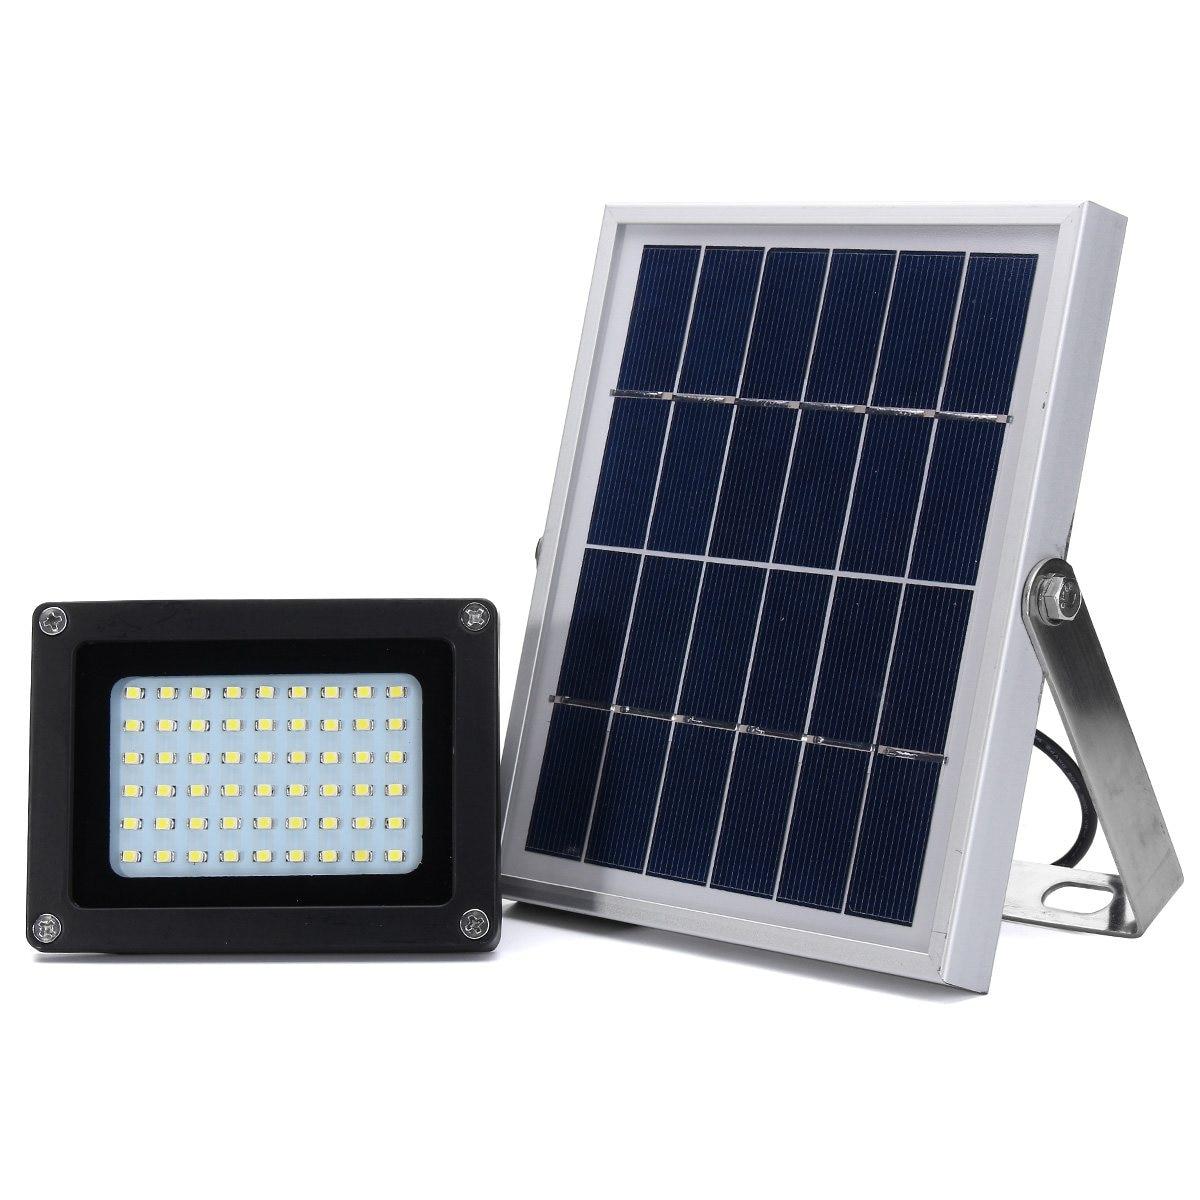 Manual/Light Control Solar Powered 54 LED Solar Light 3528 smd Dusk-to-Dawn Sensor Waterproof Outdoor Security LED Flood Light<br>